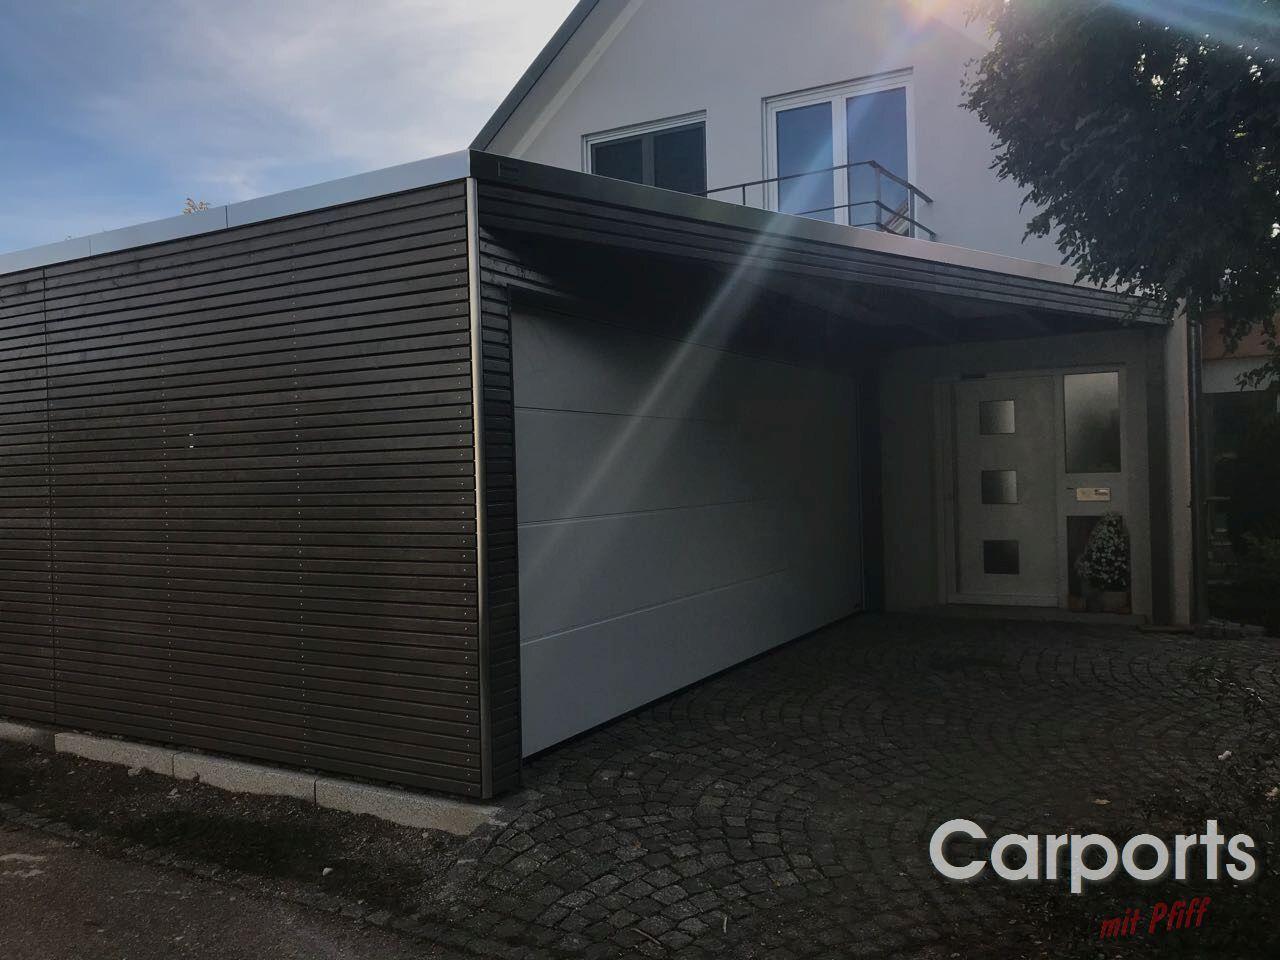 Carport bauhaus rhombo mit abstellraum und h rmann sektionaltor carports mit pfiff - Carport bauhaus ...